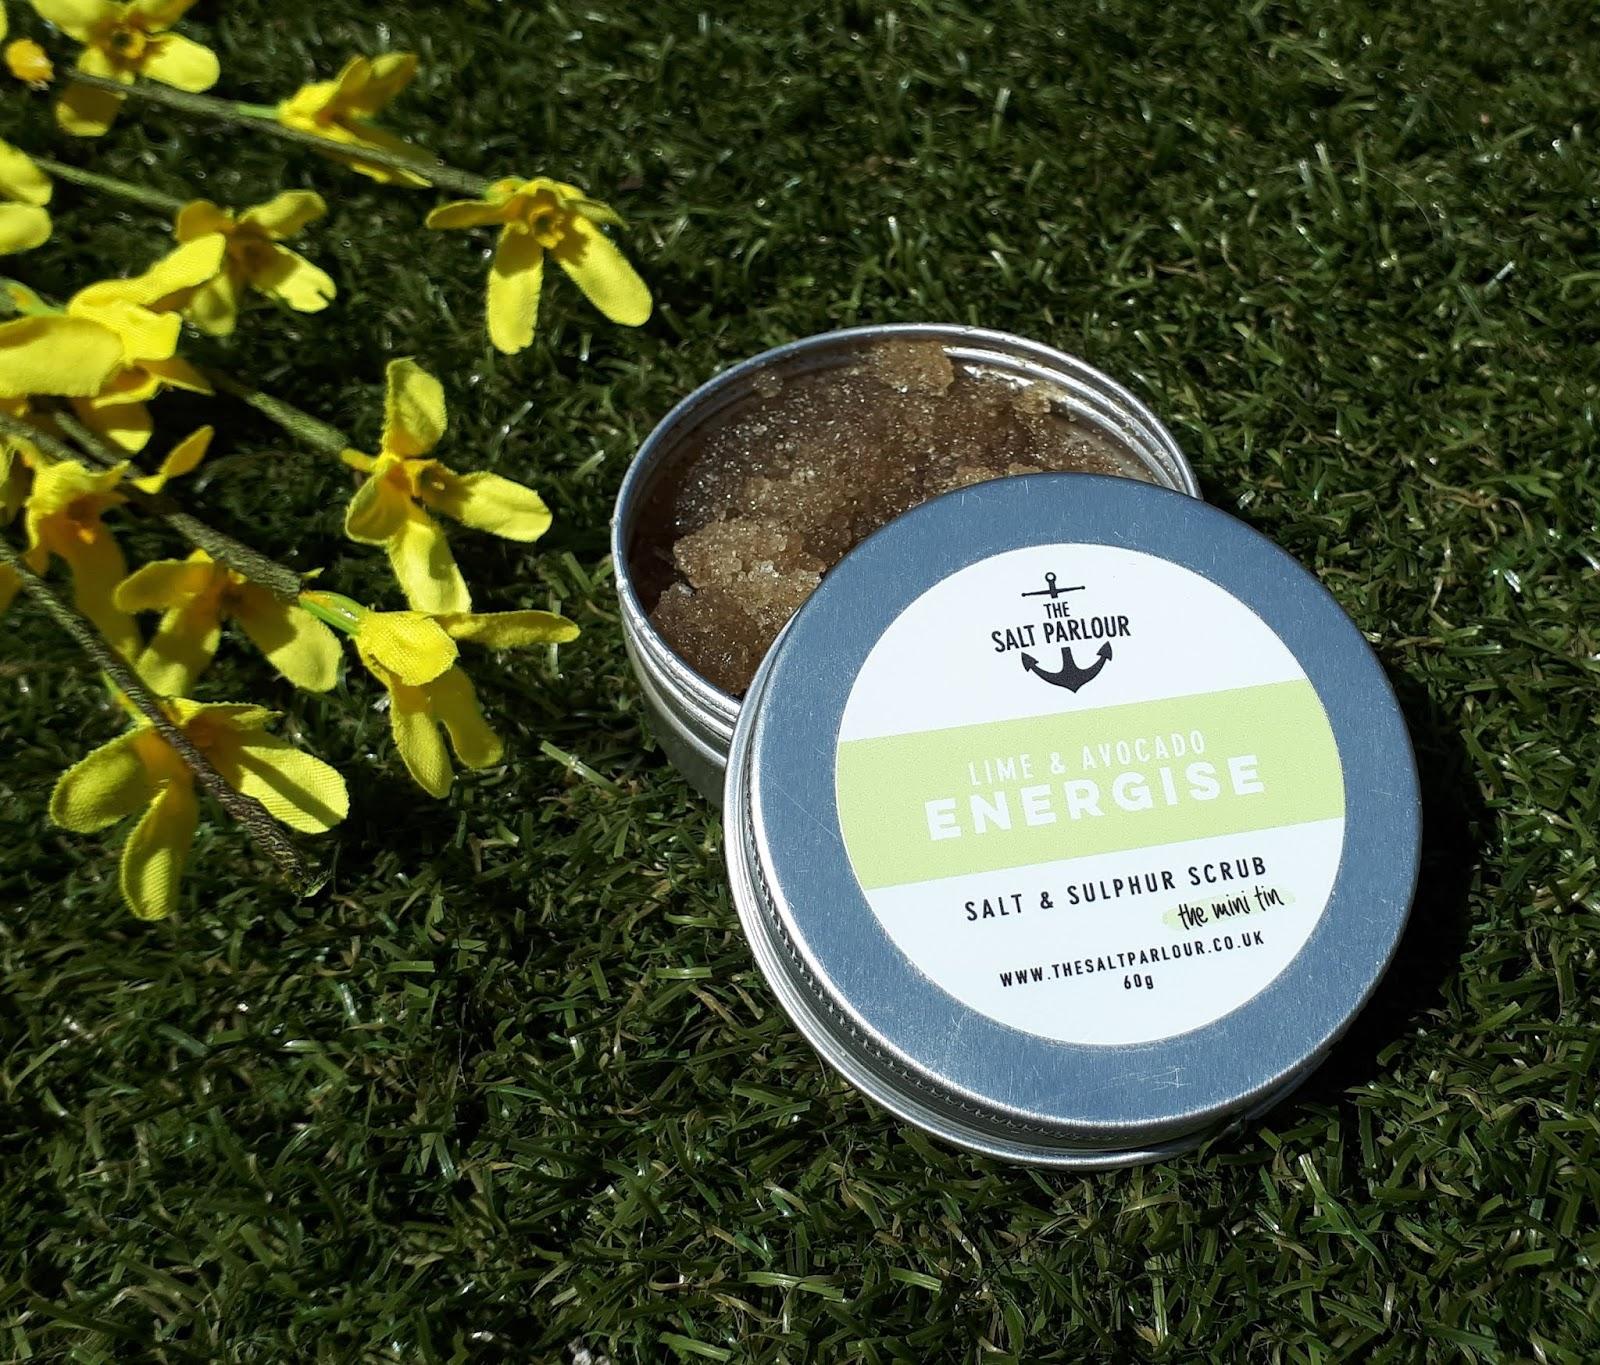 Plastic Free summer essentials - The Salt Parlour energize scrub review